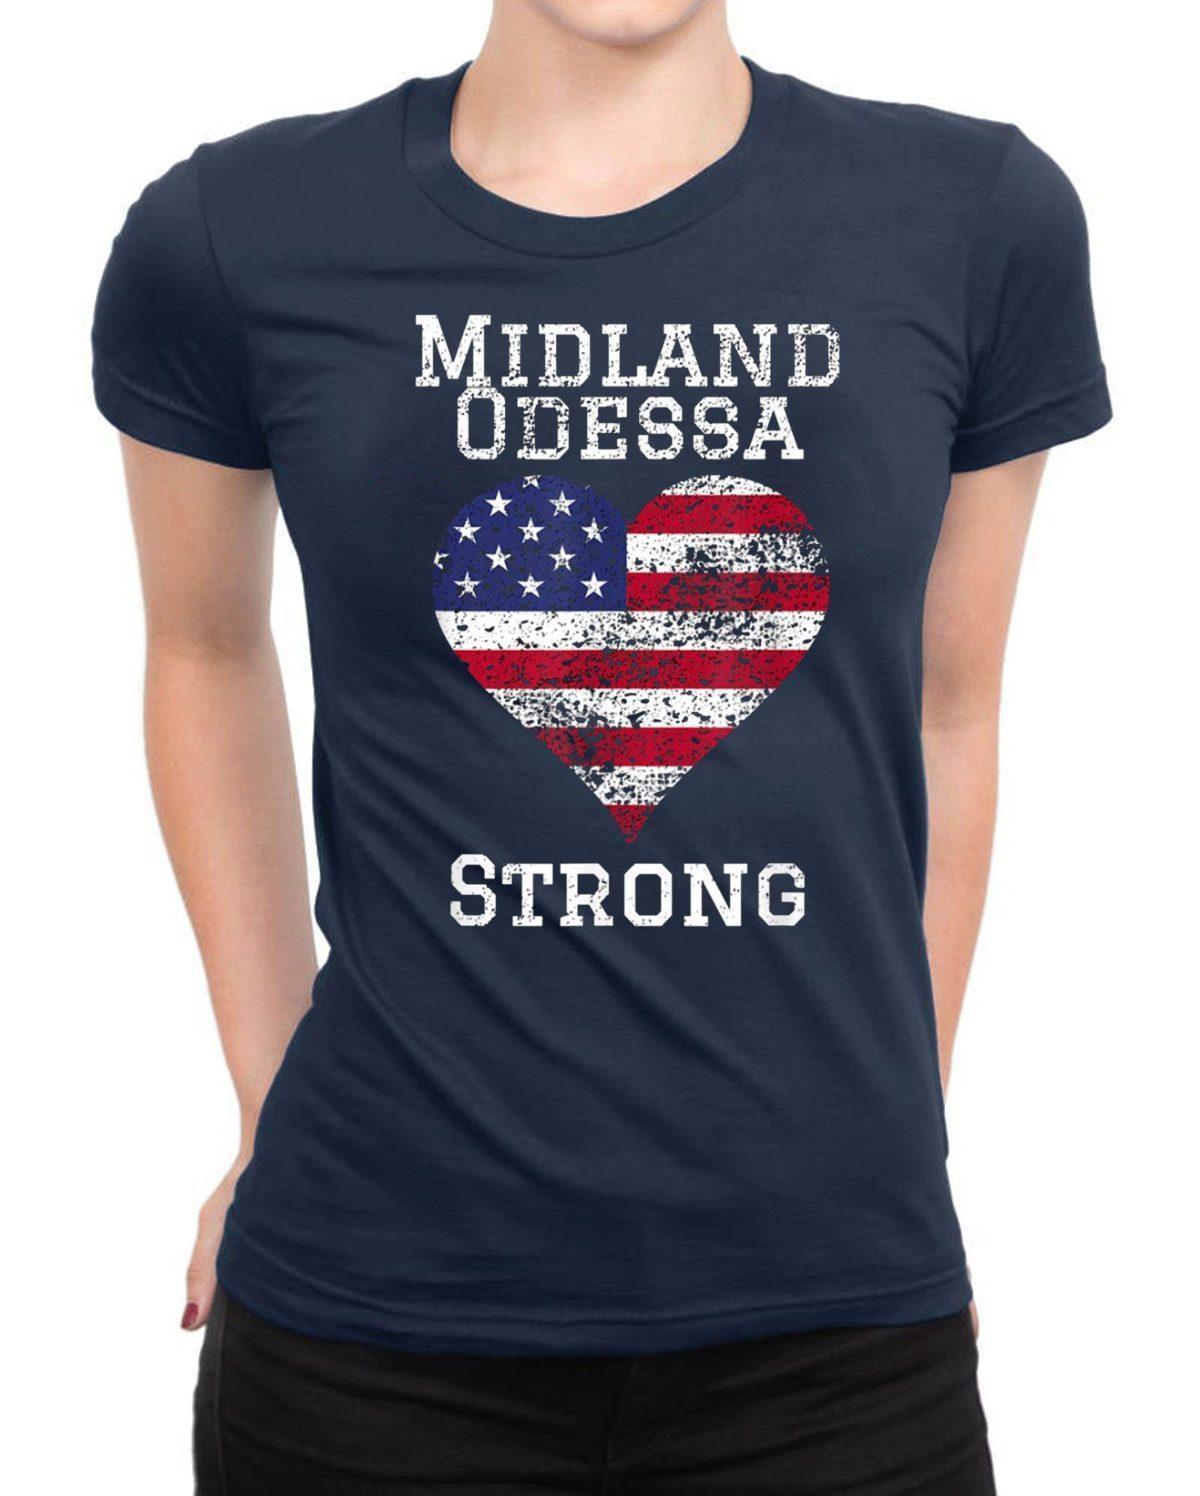 Odessa Midland Texas Strong T-Shirt